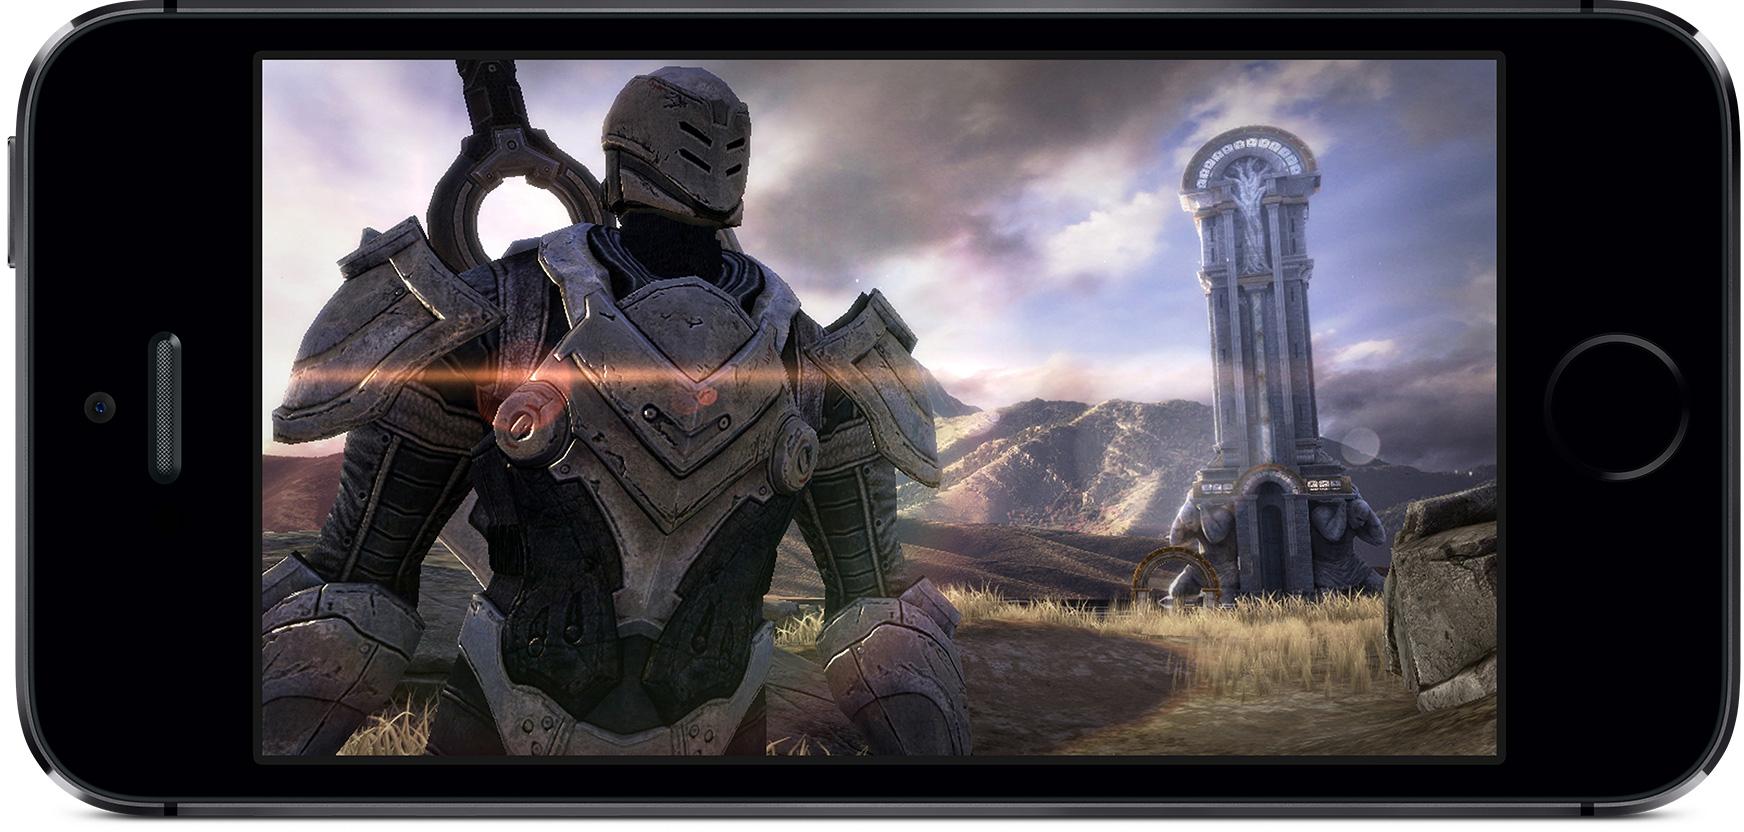 Infinity Blade III rodando no iPhone 5s